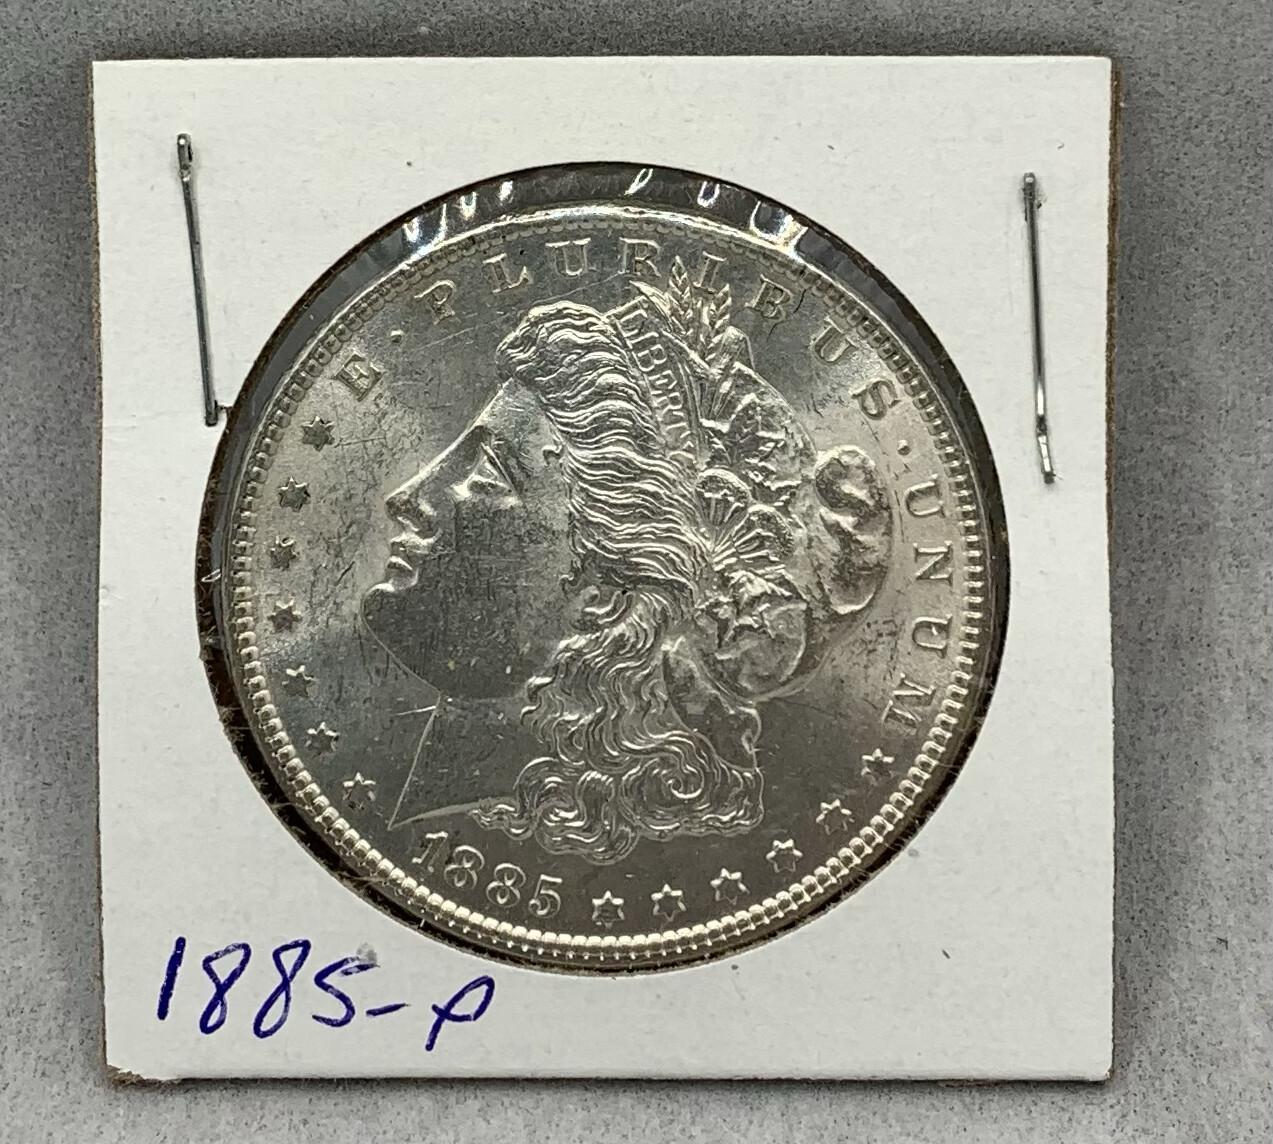 1885 Morgan Silver Dollar Mint Luster - Philadelphia Mint